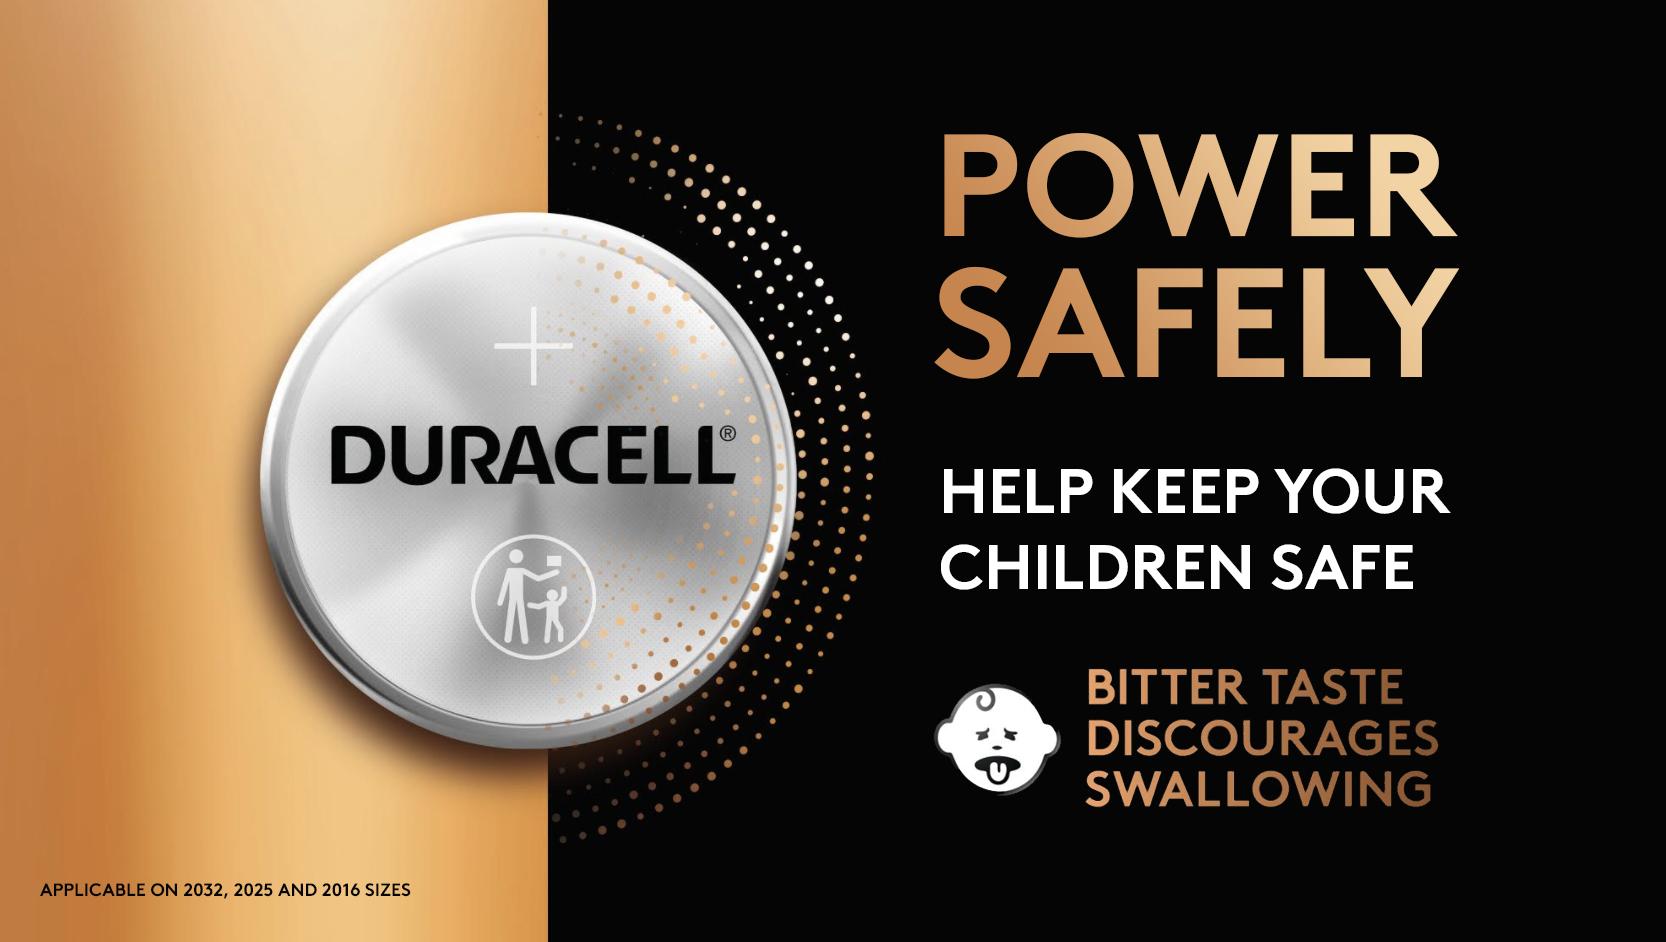 Power Safely. Help keep your children safe. Bitter taste discourages swallowing.